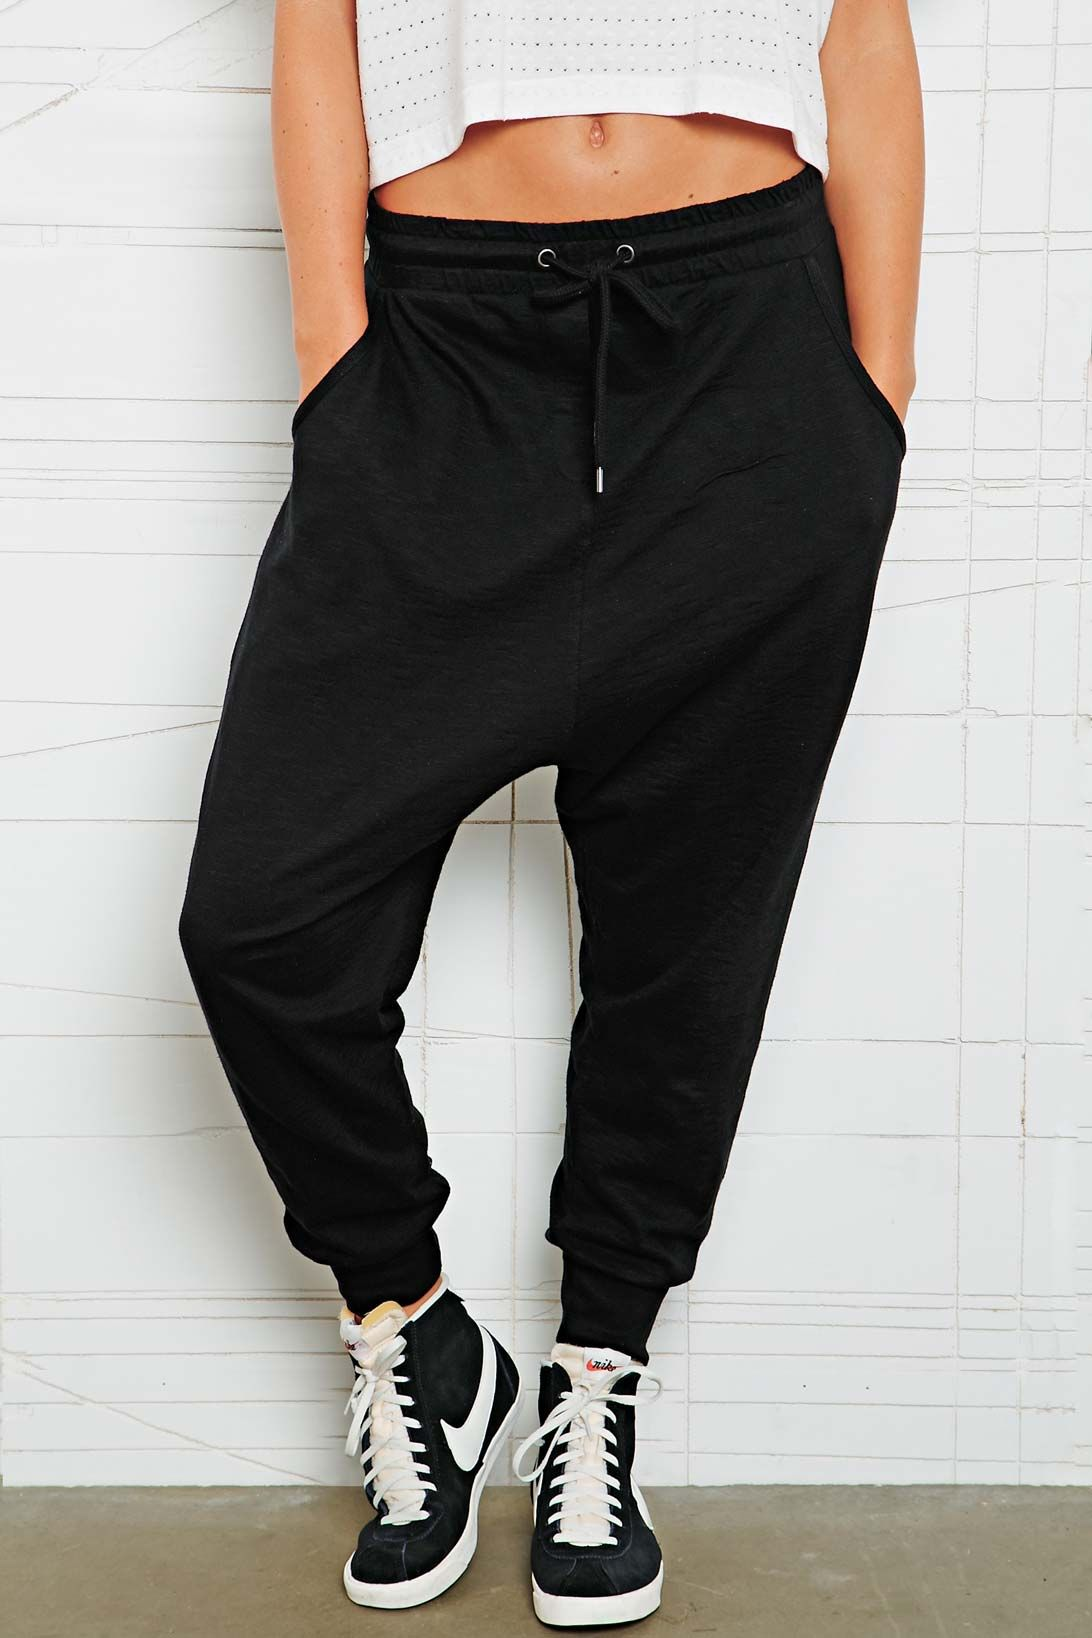 pants nike nike blazer shoes high top sneakers black sweatpants harem pants  black t-shirt joggers harem sweatpants black harem pants sweatpants grey  harem ...